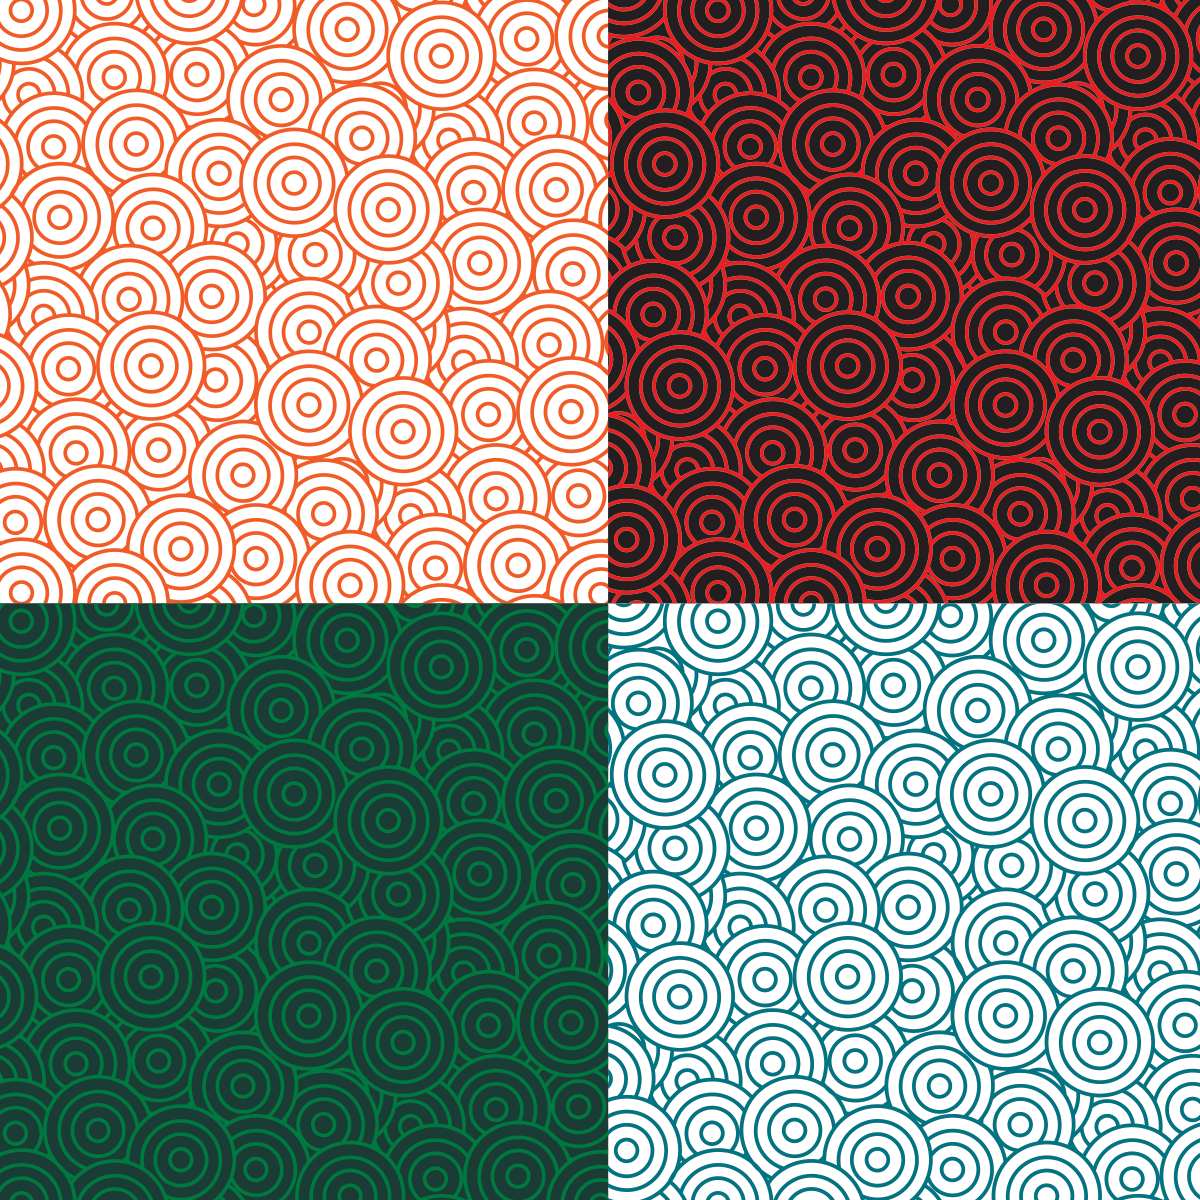 Pattern 40